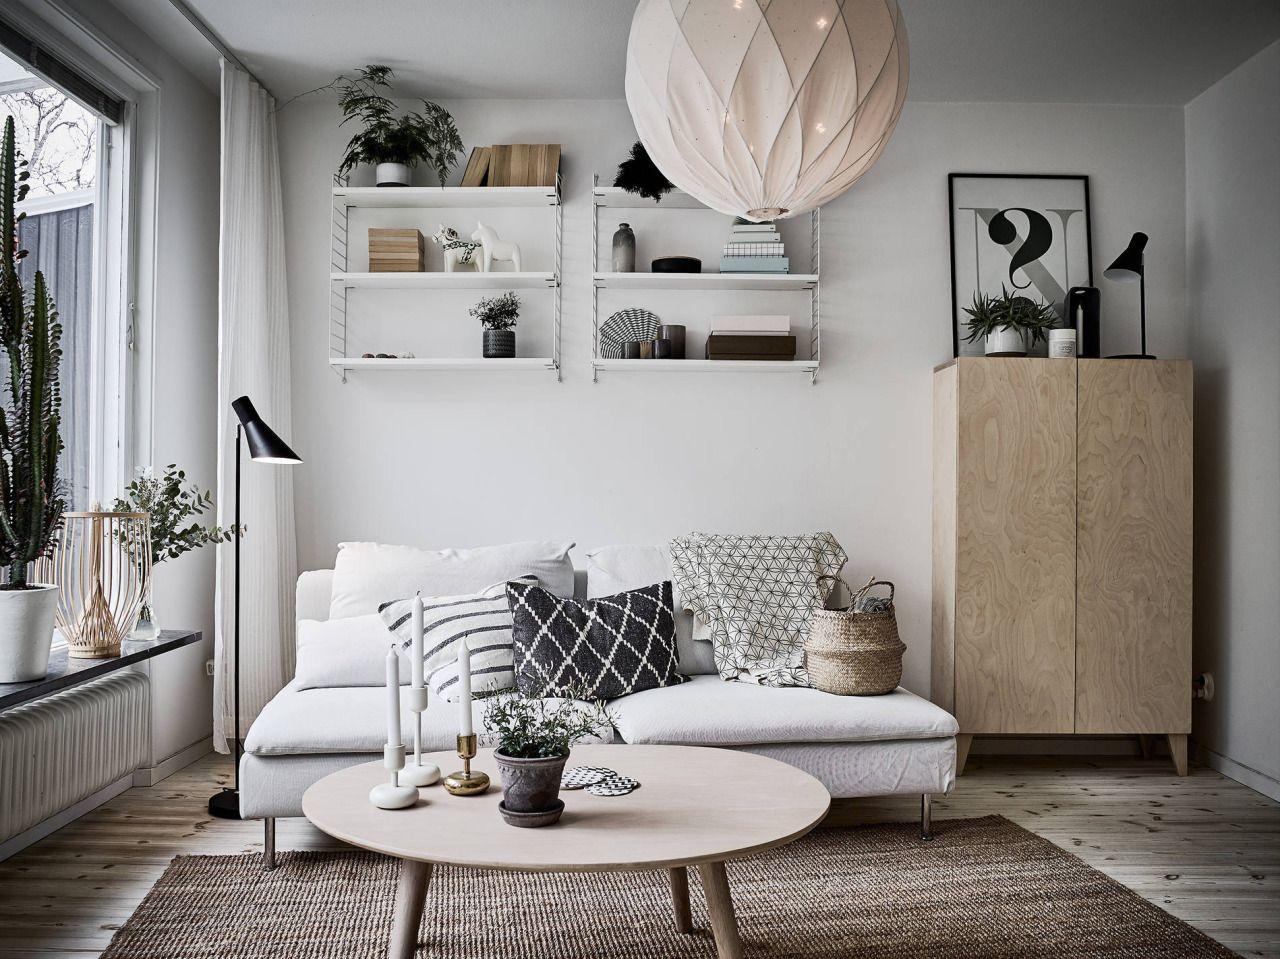 Ikea Wohnzimmer Skandinavisch Home Living Room Interior